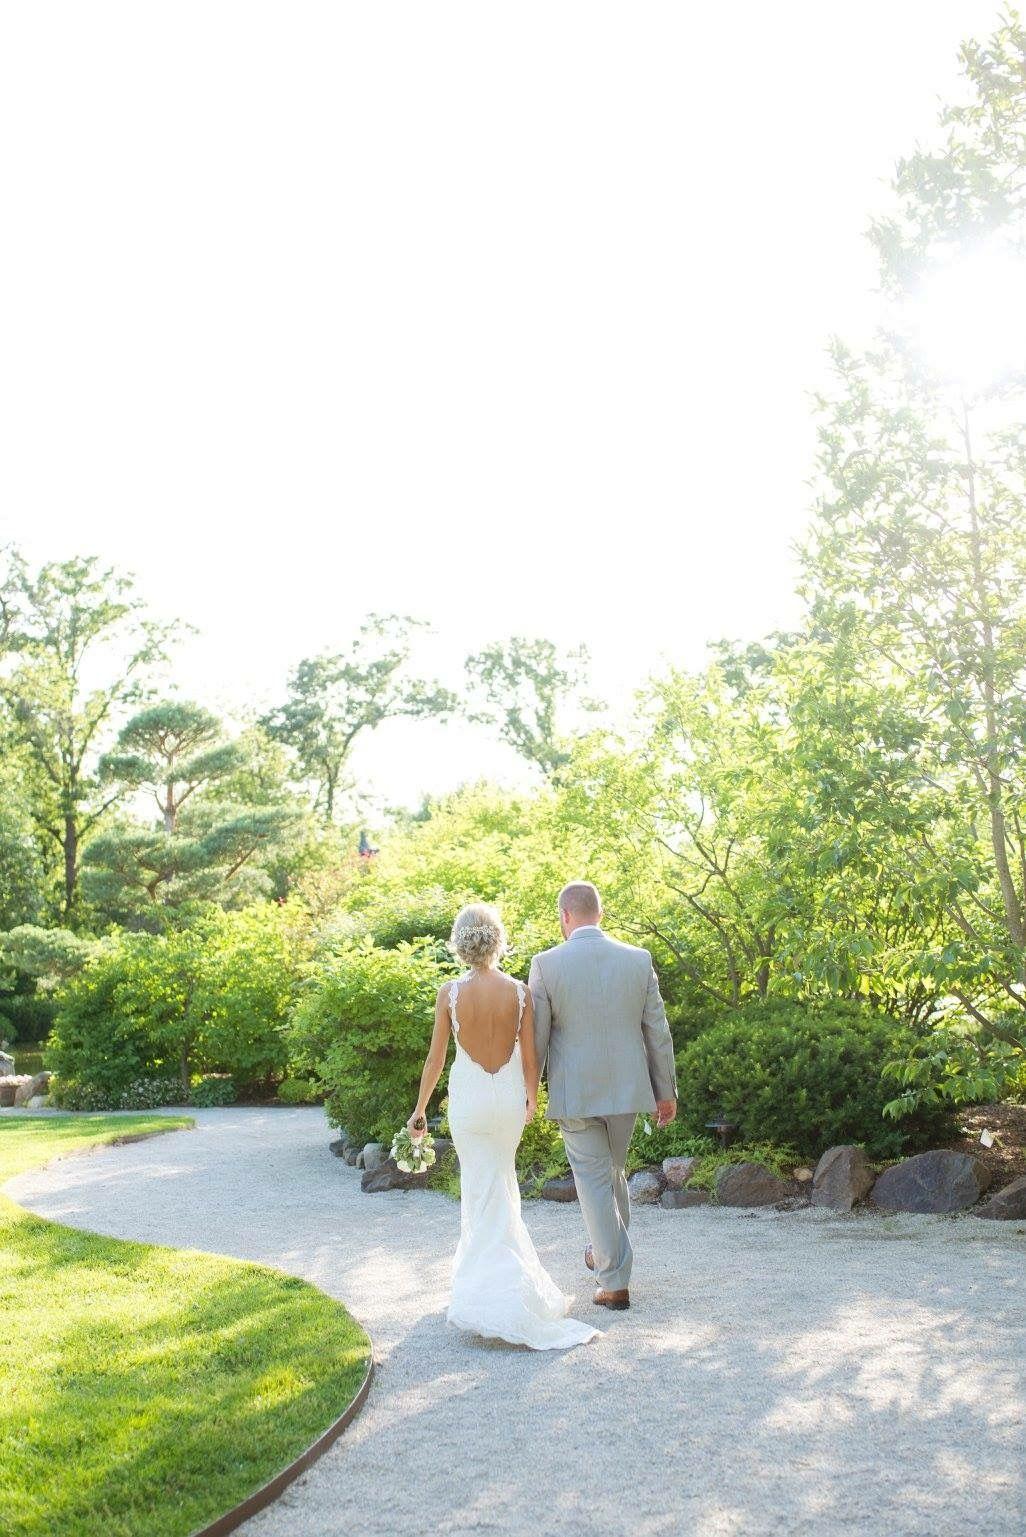 Pin By Megan Stephens On Our Wedding Wedding Dresses Our Wedding Wedding